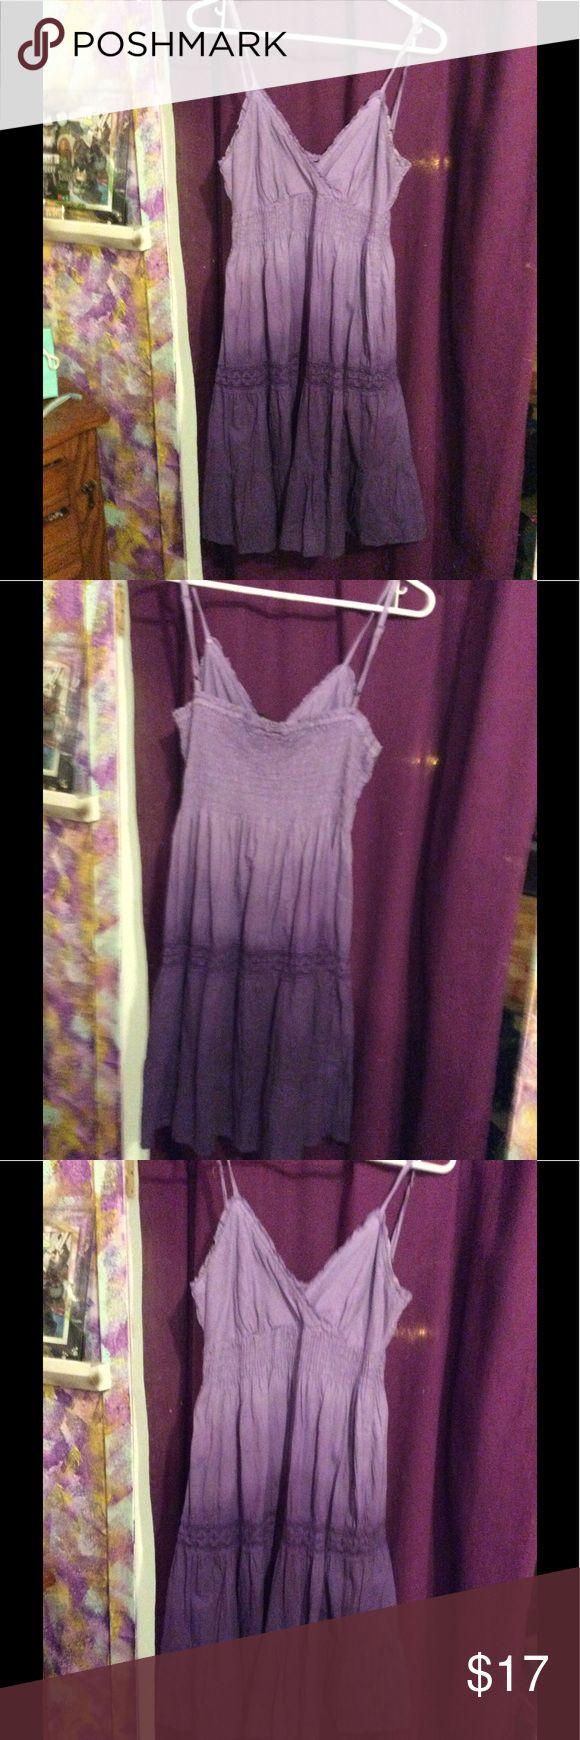 Light to dark purple sundress Never worn light weight and light to dark purple sundress Dresses Midi